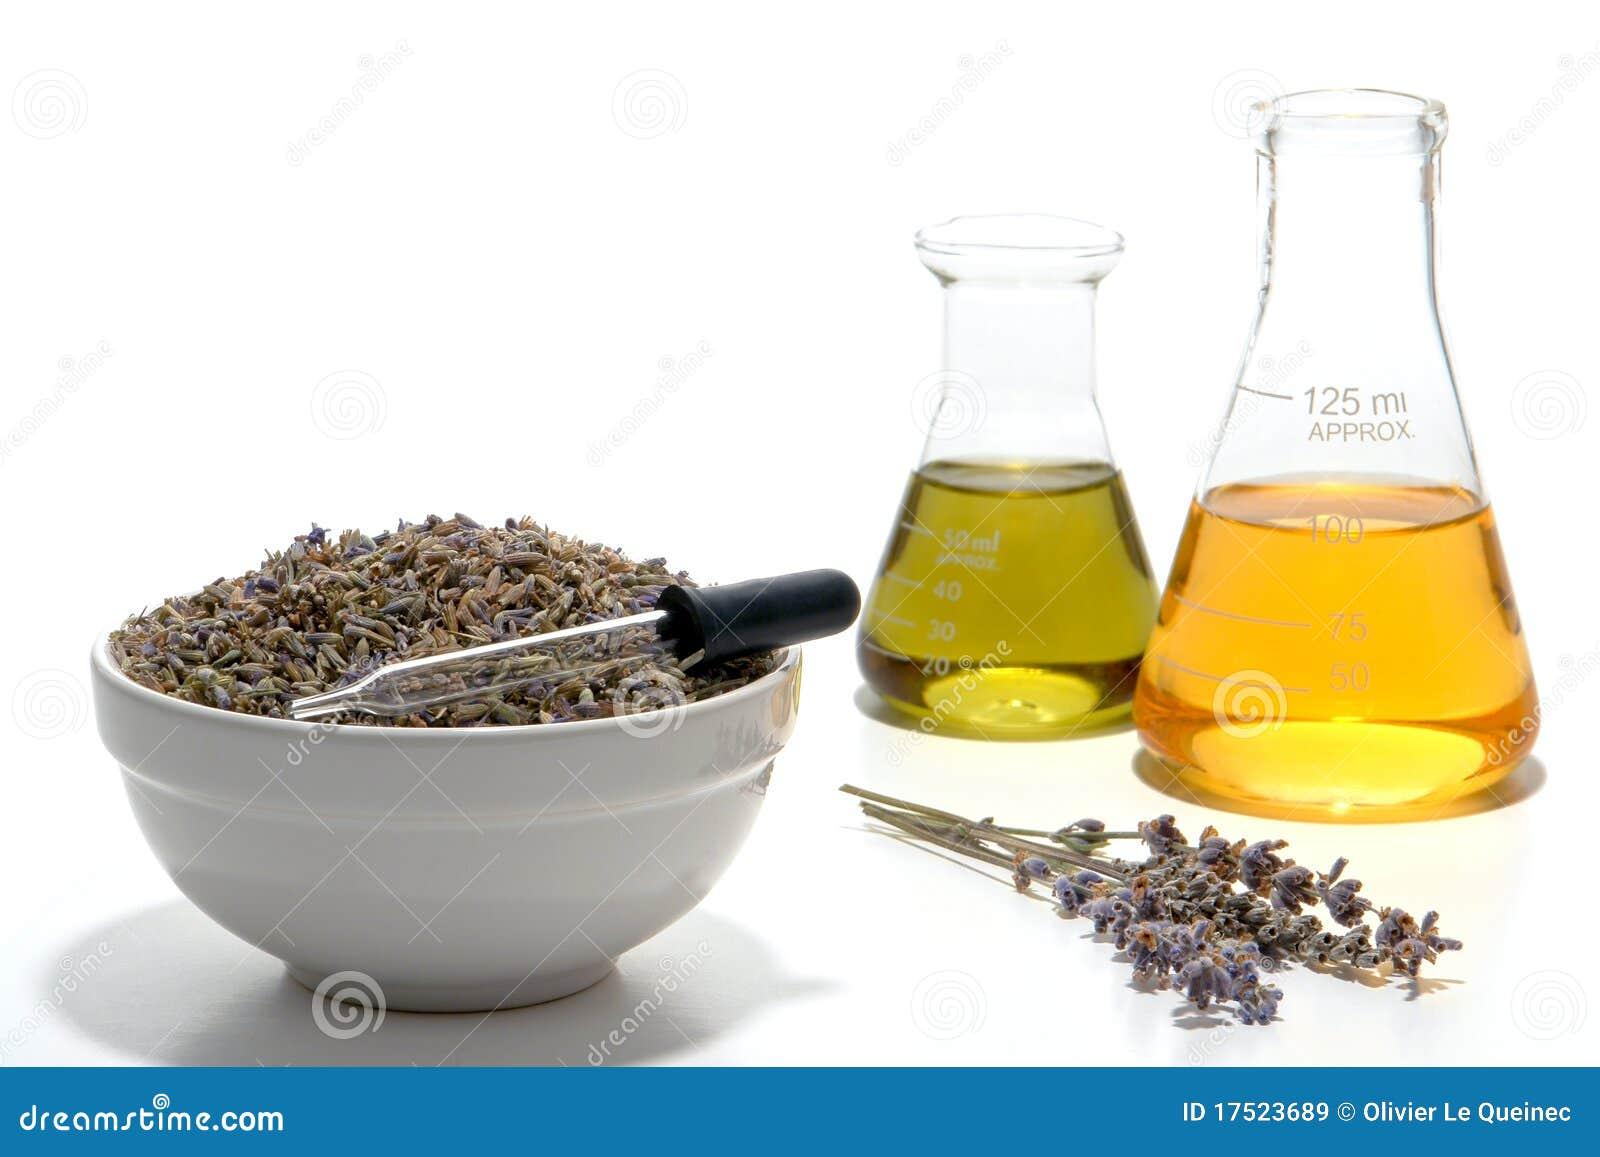 Lavender Aromatherapy Essential Oil Preparation